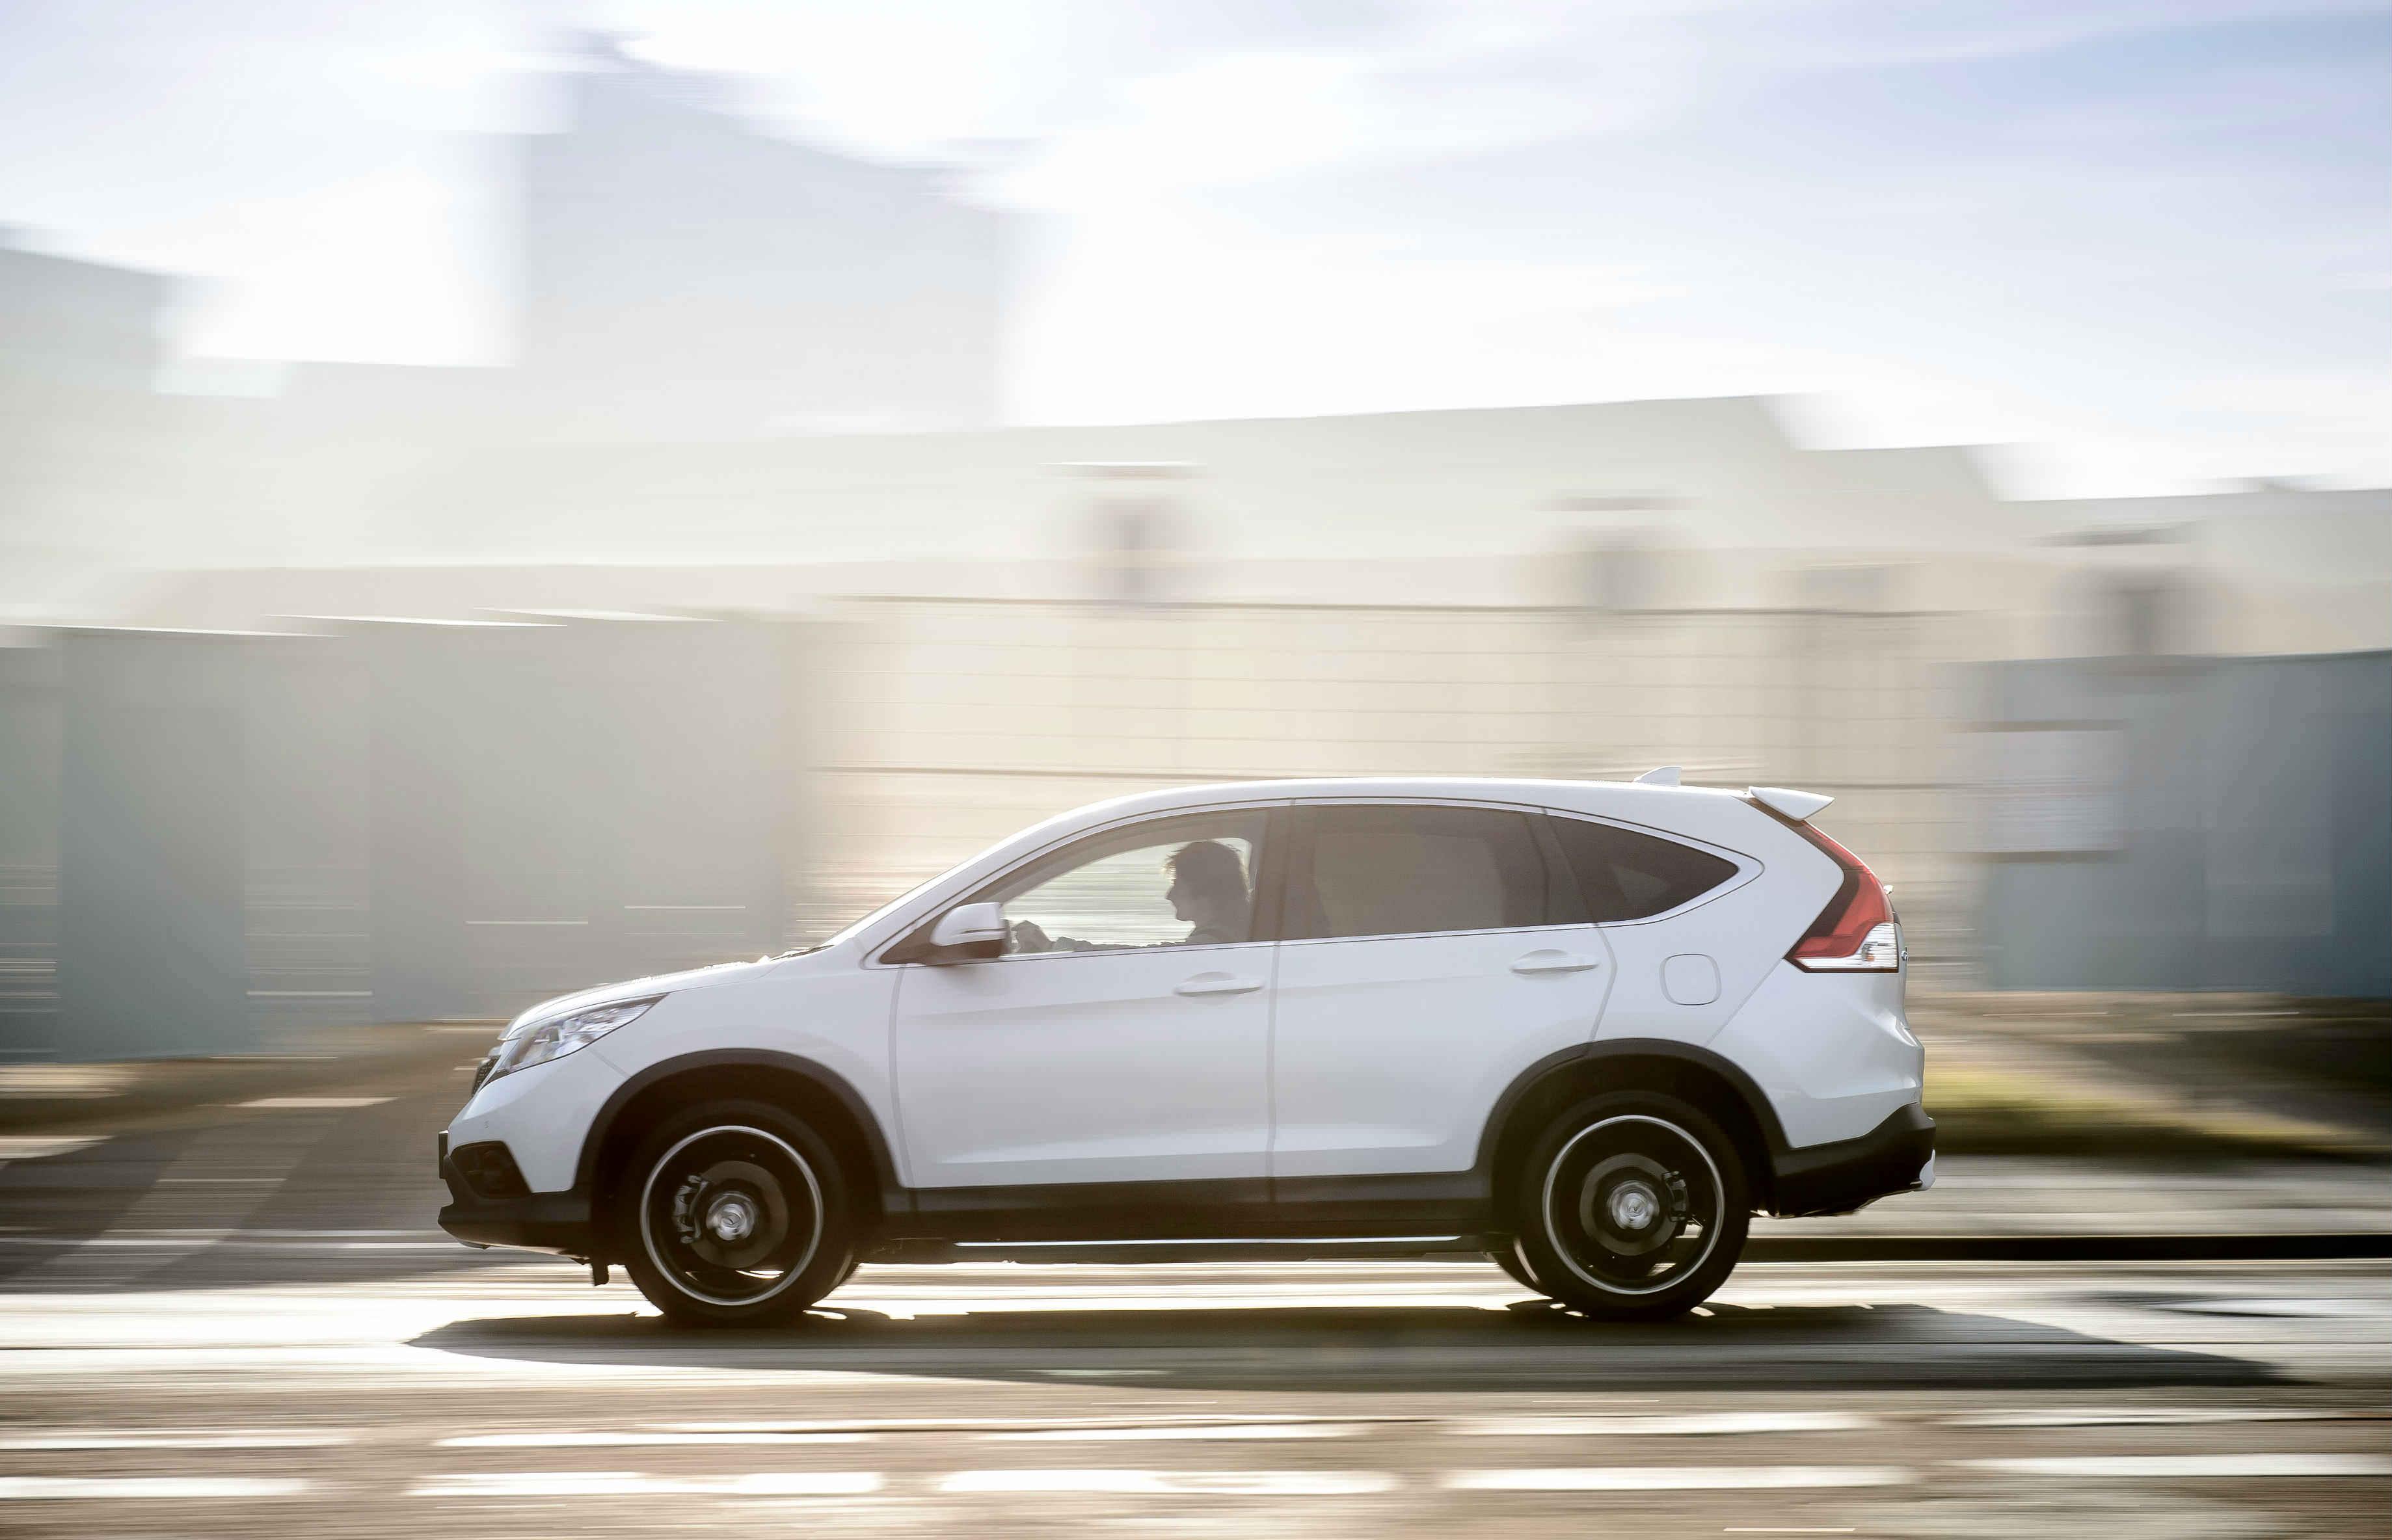 Guide to used SUVs with panoramic sunroof - White Honda CRV